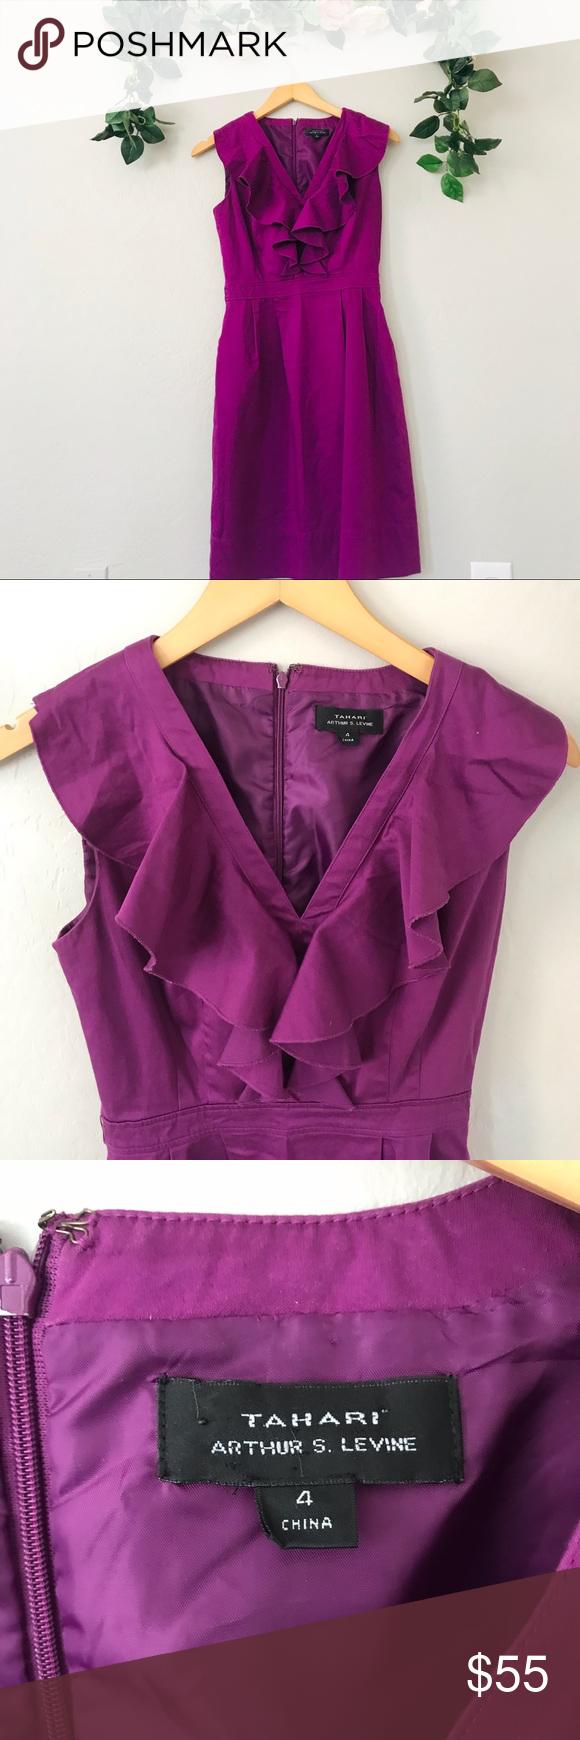 Tahari Purple V Neck Dress Size 4 Clothes Design V Neck Dress Colorful Dresses [ 1740 x 580 Pixel ]